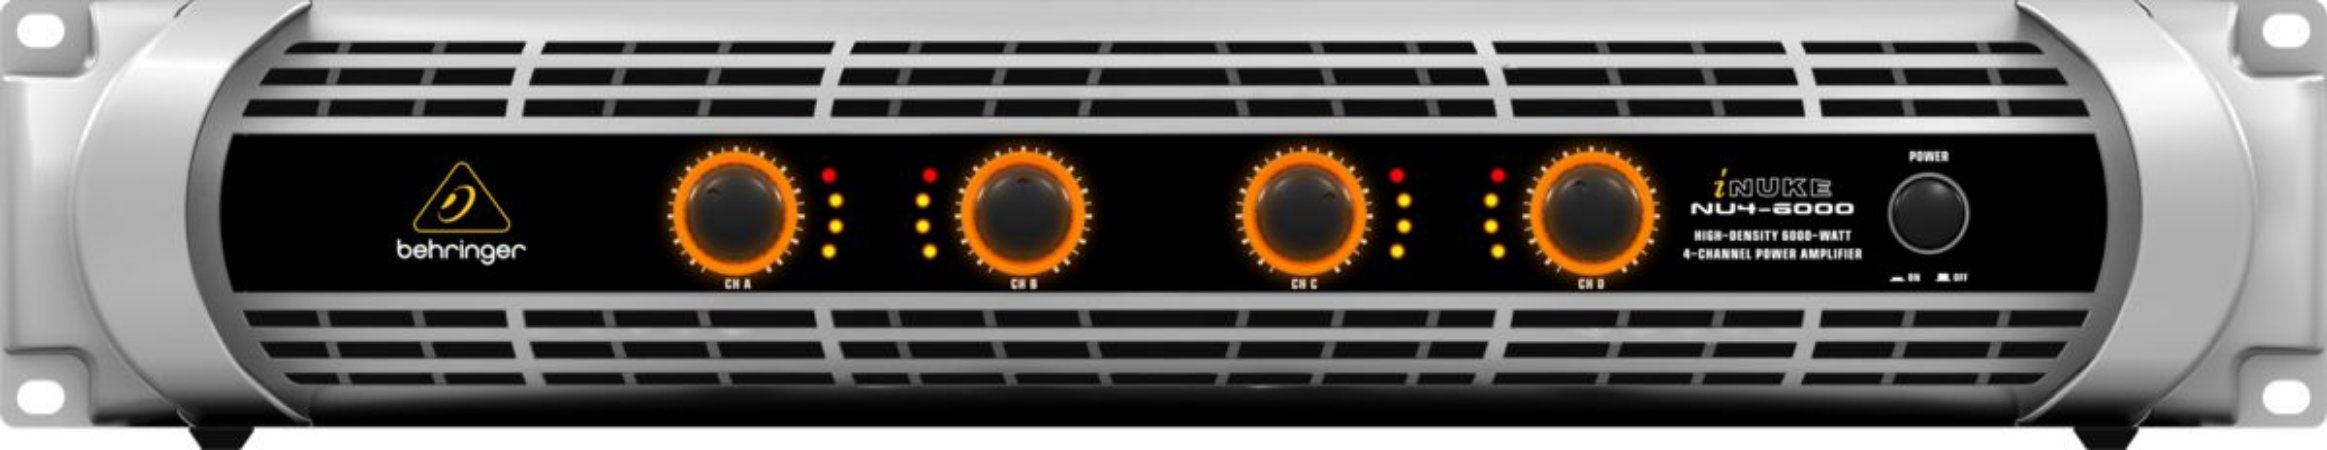 Amplificador de Potência Behringer  Inuke NU4-6000 6000W  220V